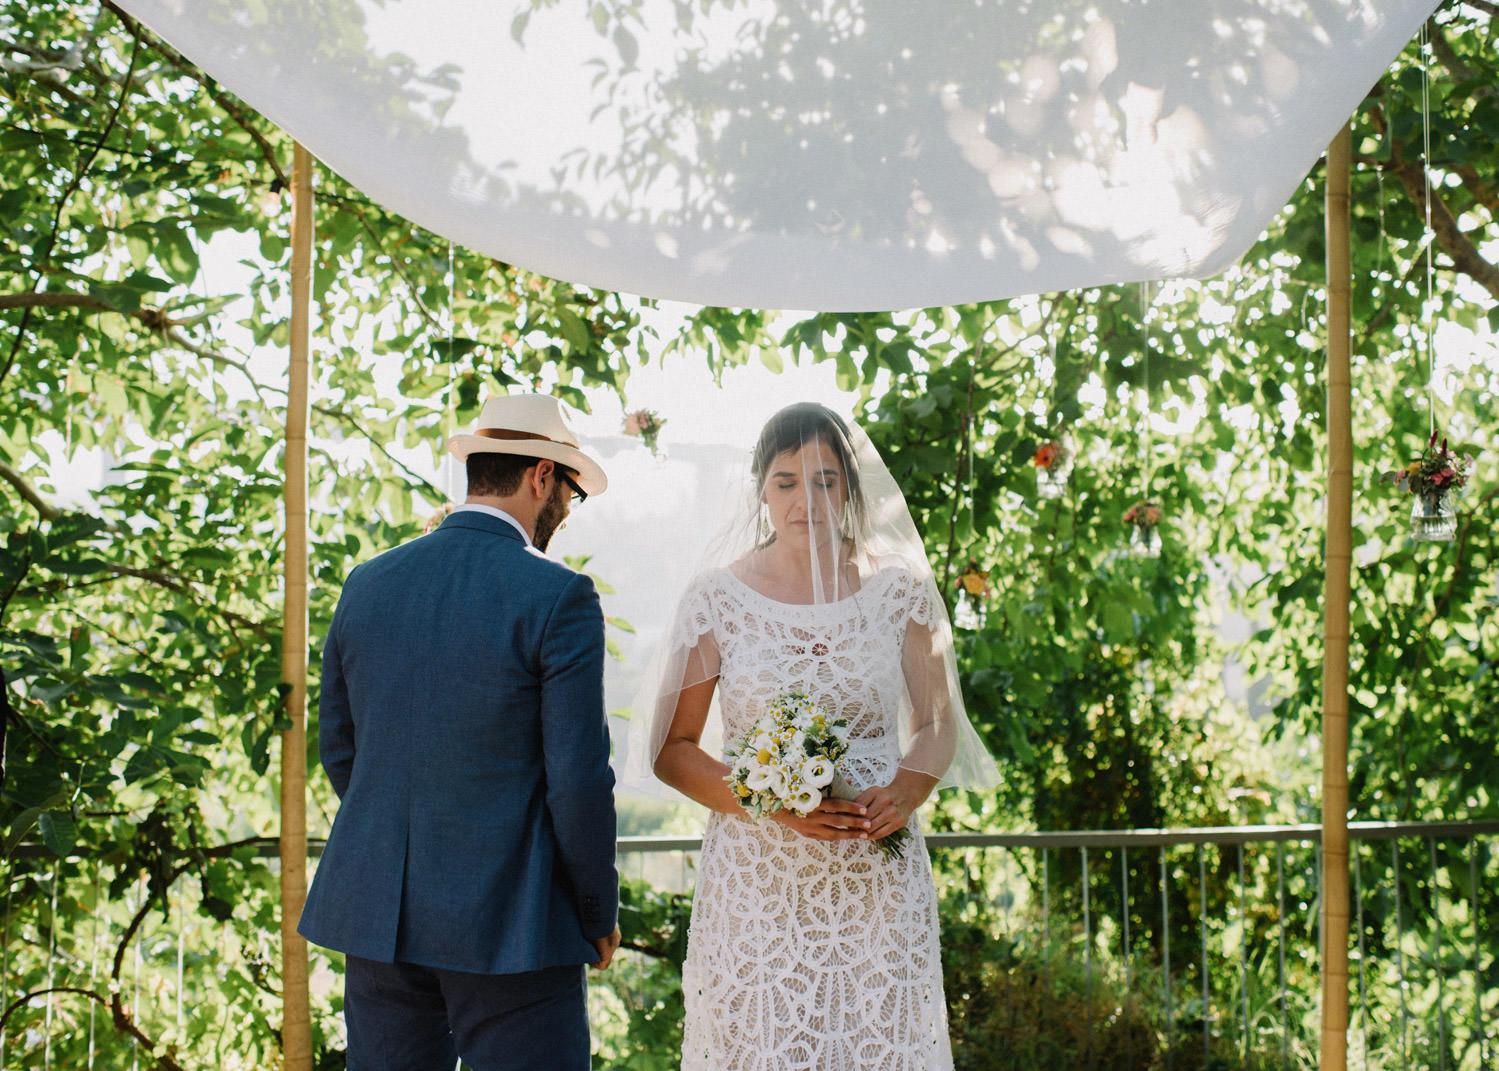 groom surrounding bride in chuppa